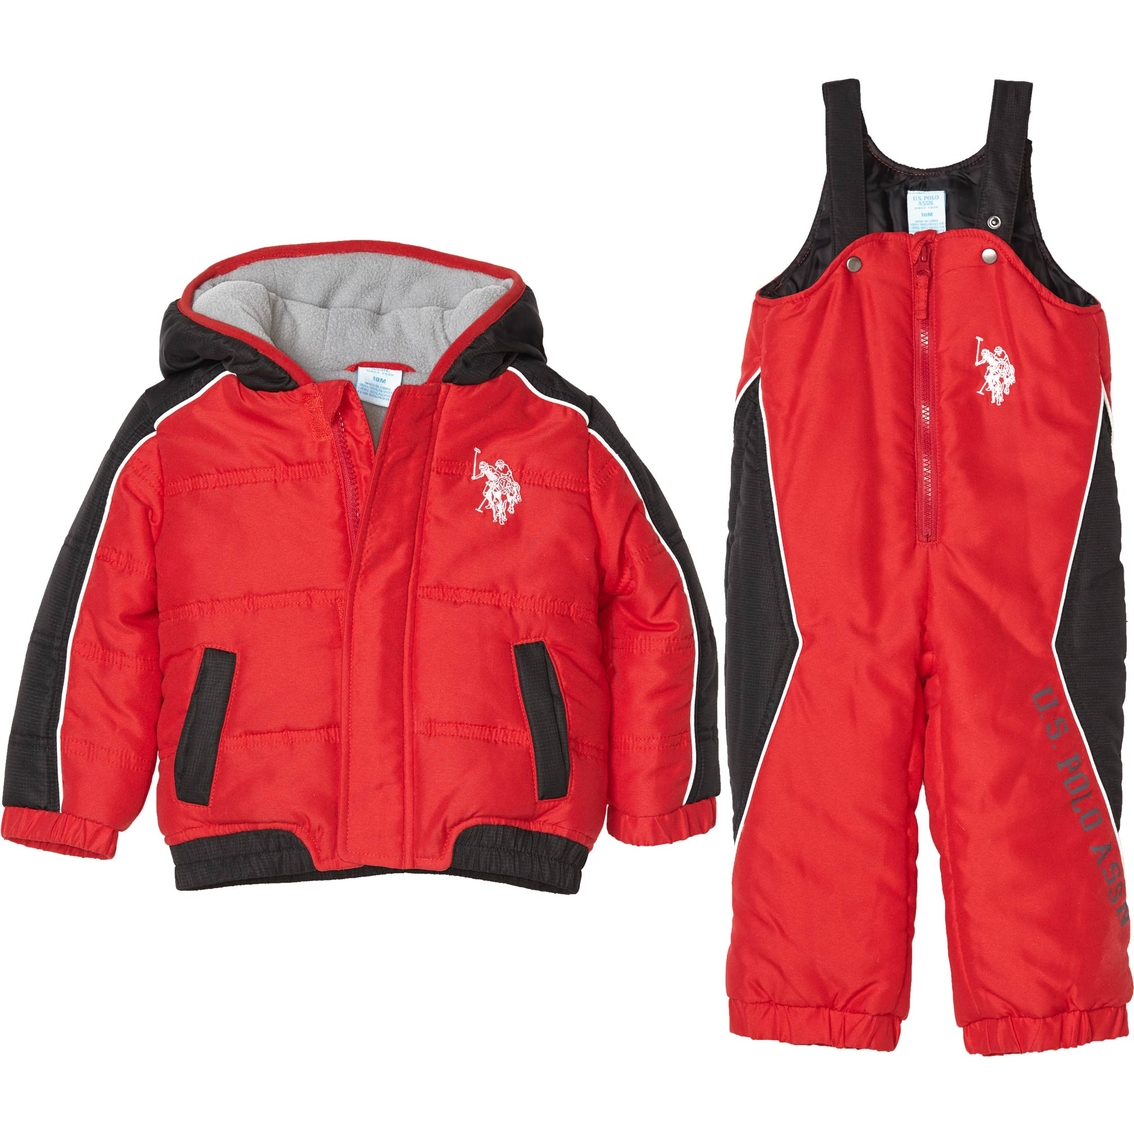 a118d616b844 U.s. Polo Assn. Toddler Boys 2 Pc. Snowsuit